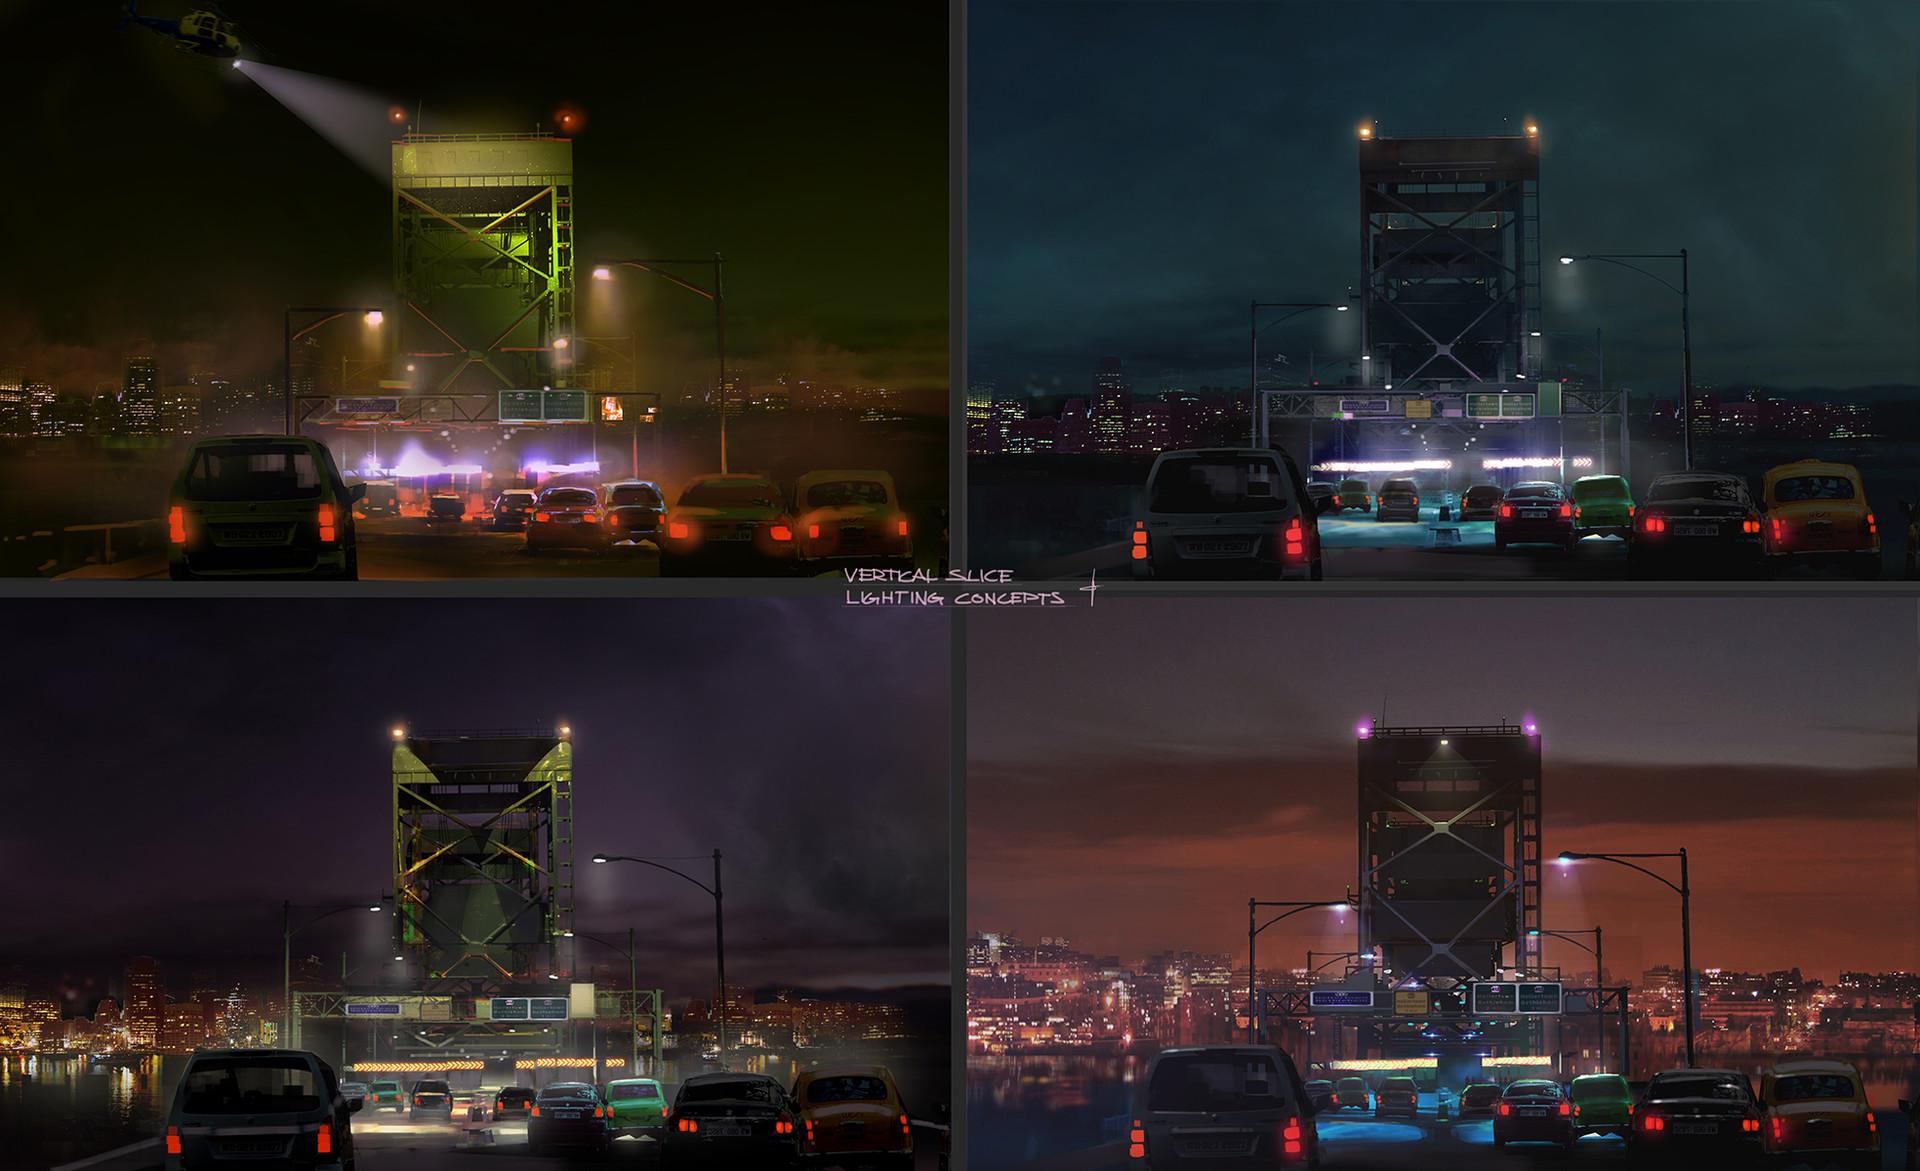 Ville assinen vs lighting concepts